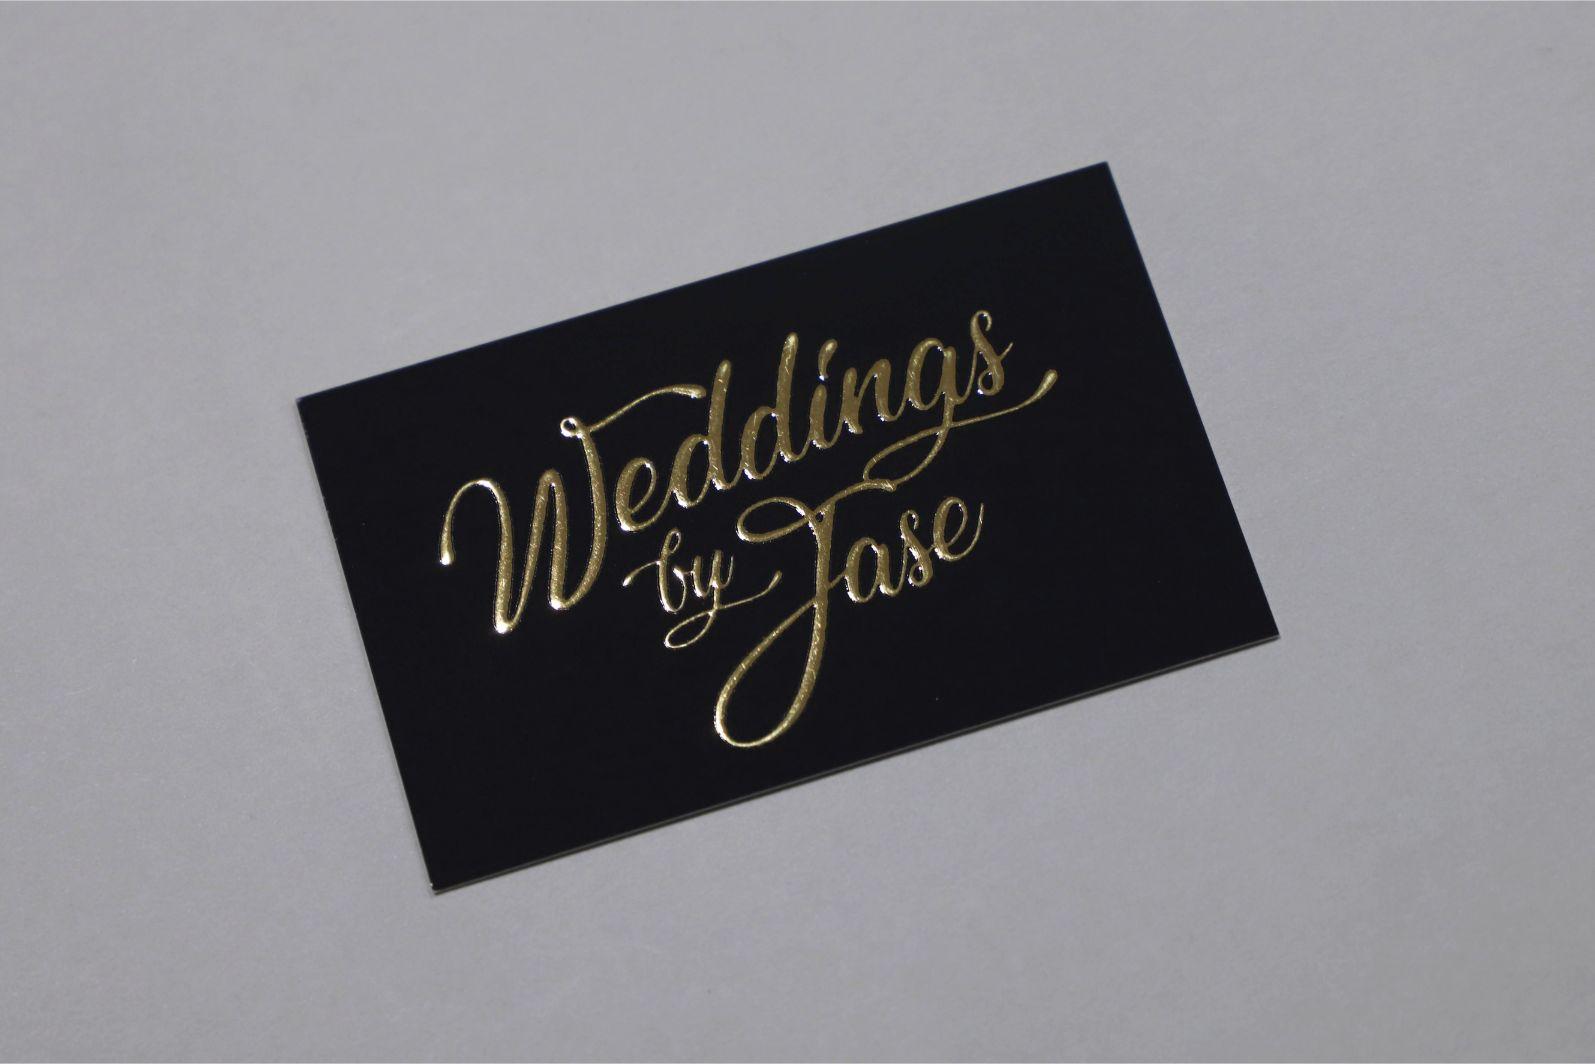 ec9b177fd14 Gold Foil Business Cards | Raised Gold Foil Printing | Free Fast ...